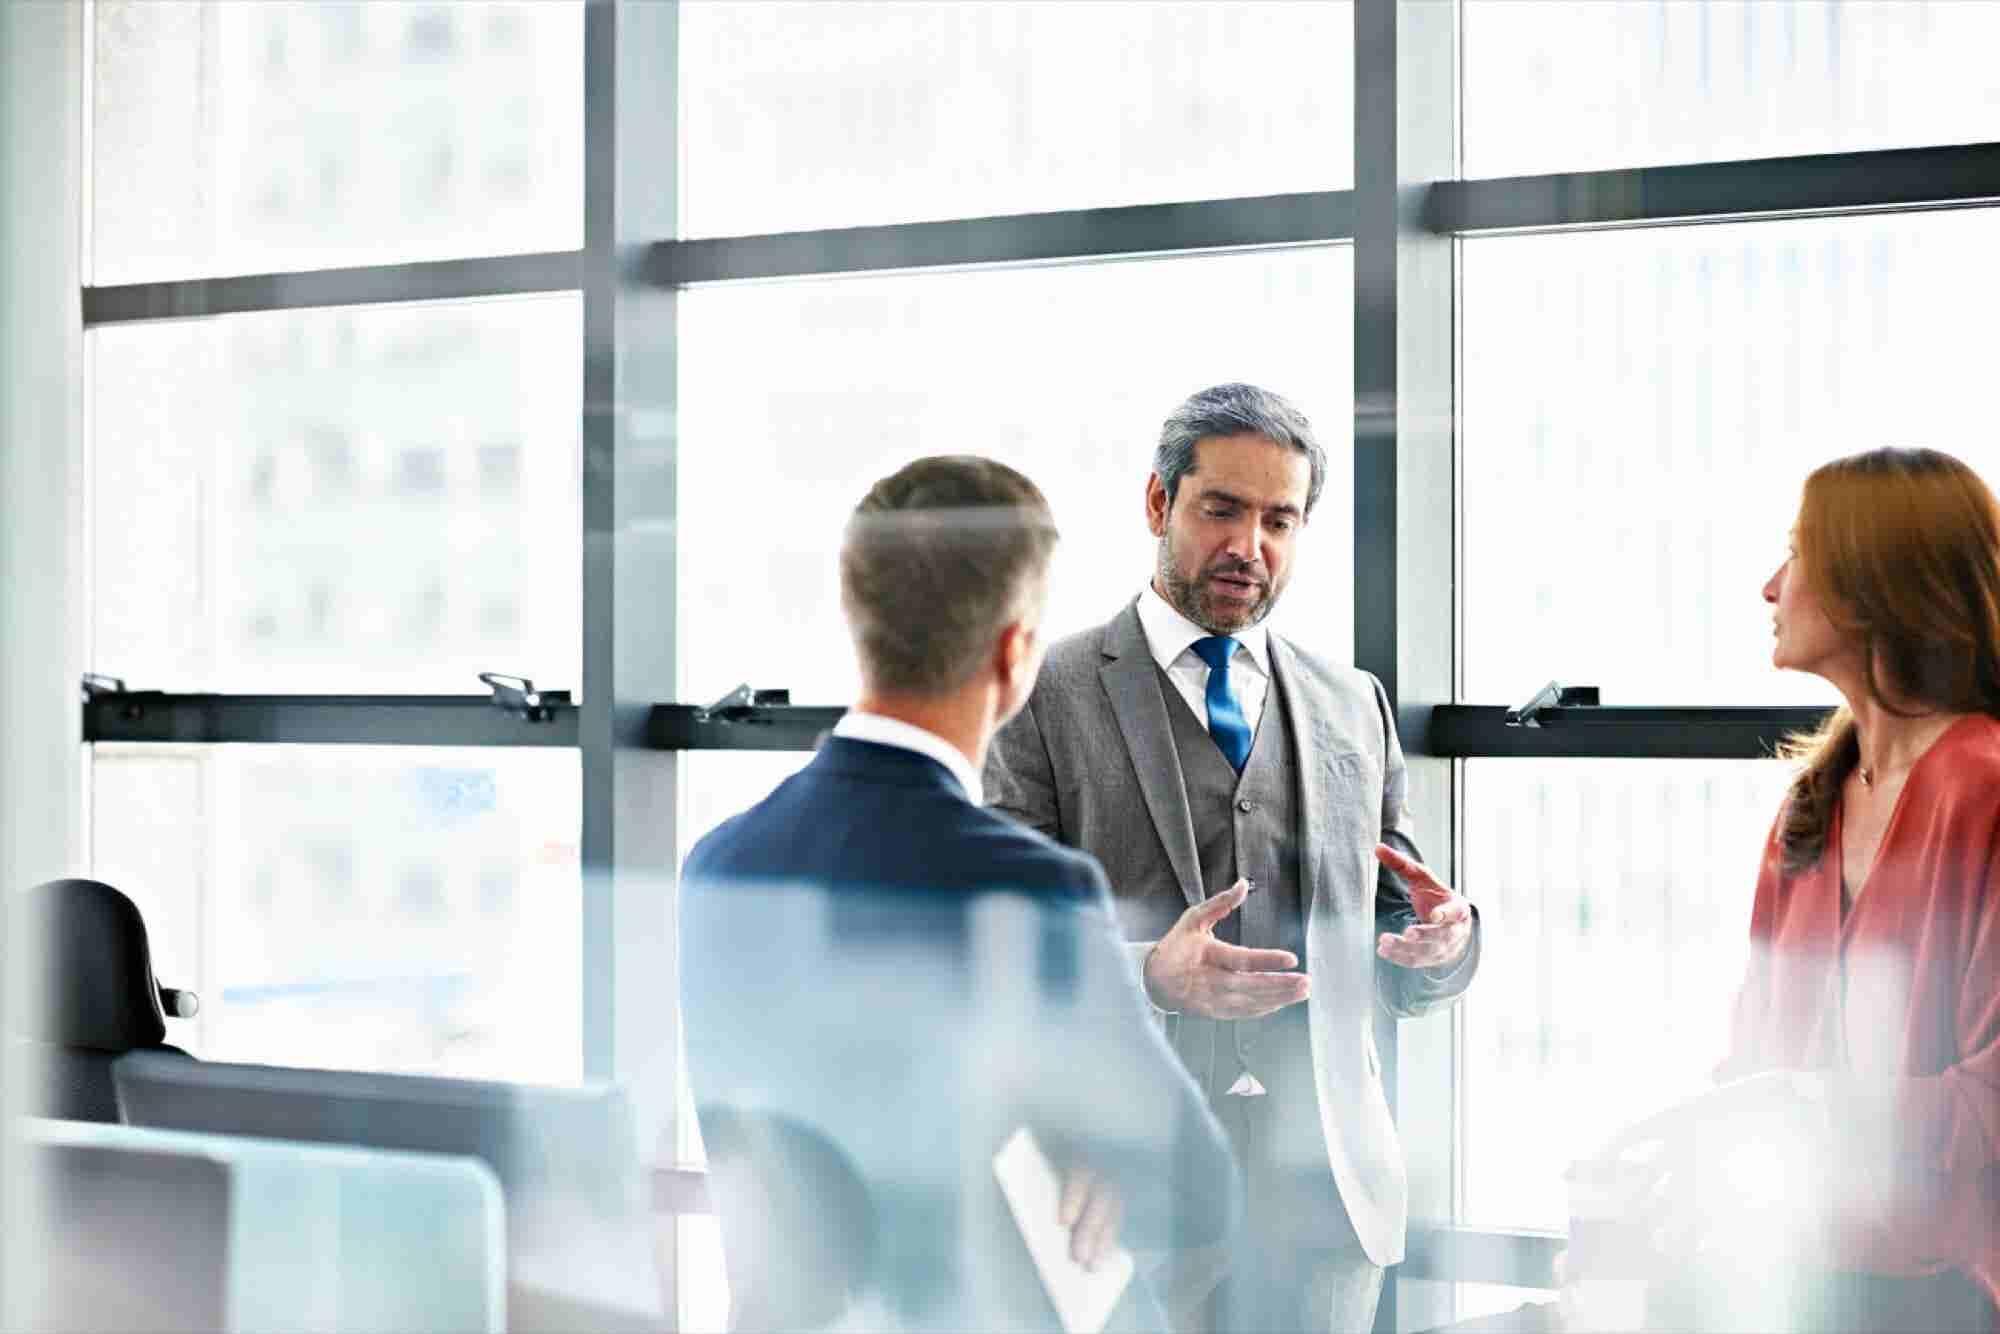 5 Ways Shunning Venture Capital Made Me a Better Leader